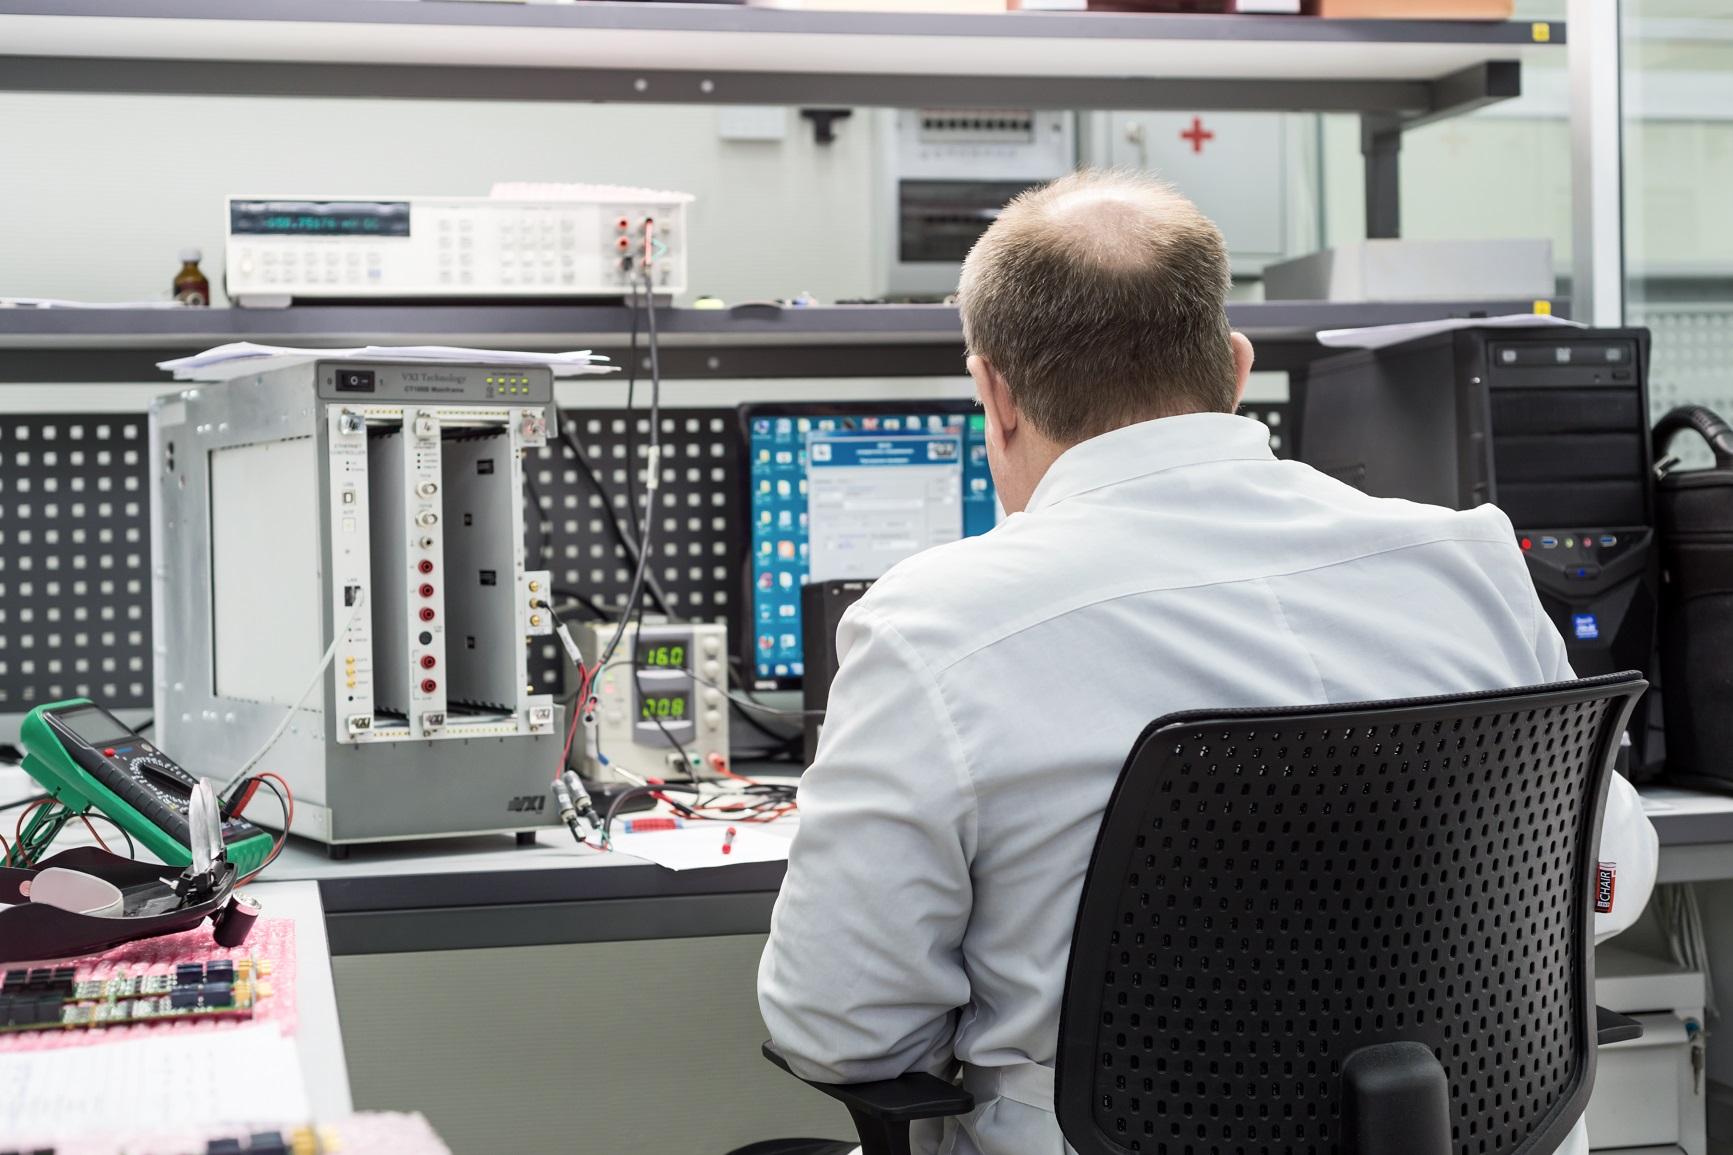 Test Jig Manufacturing Service